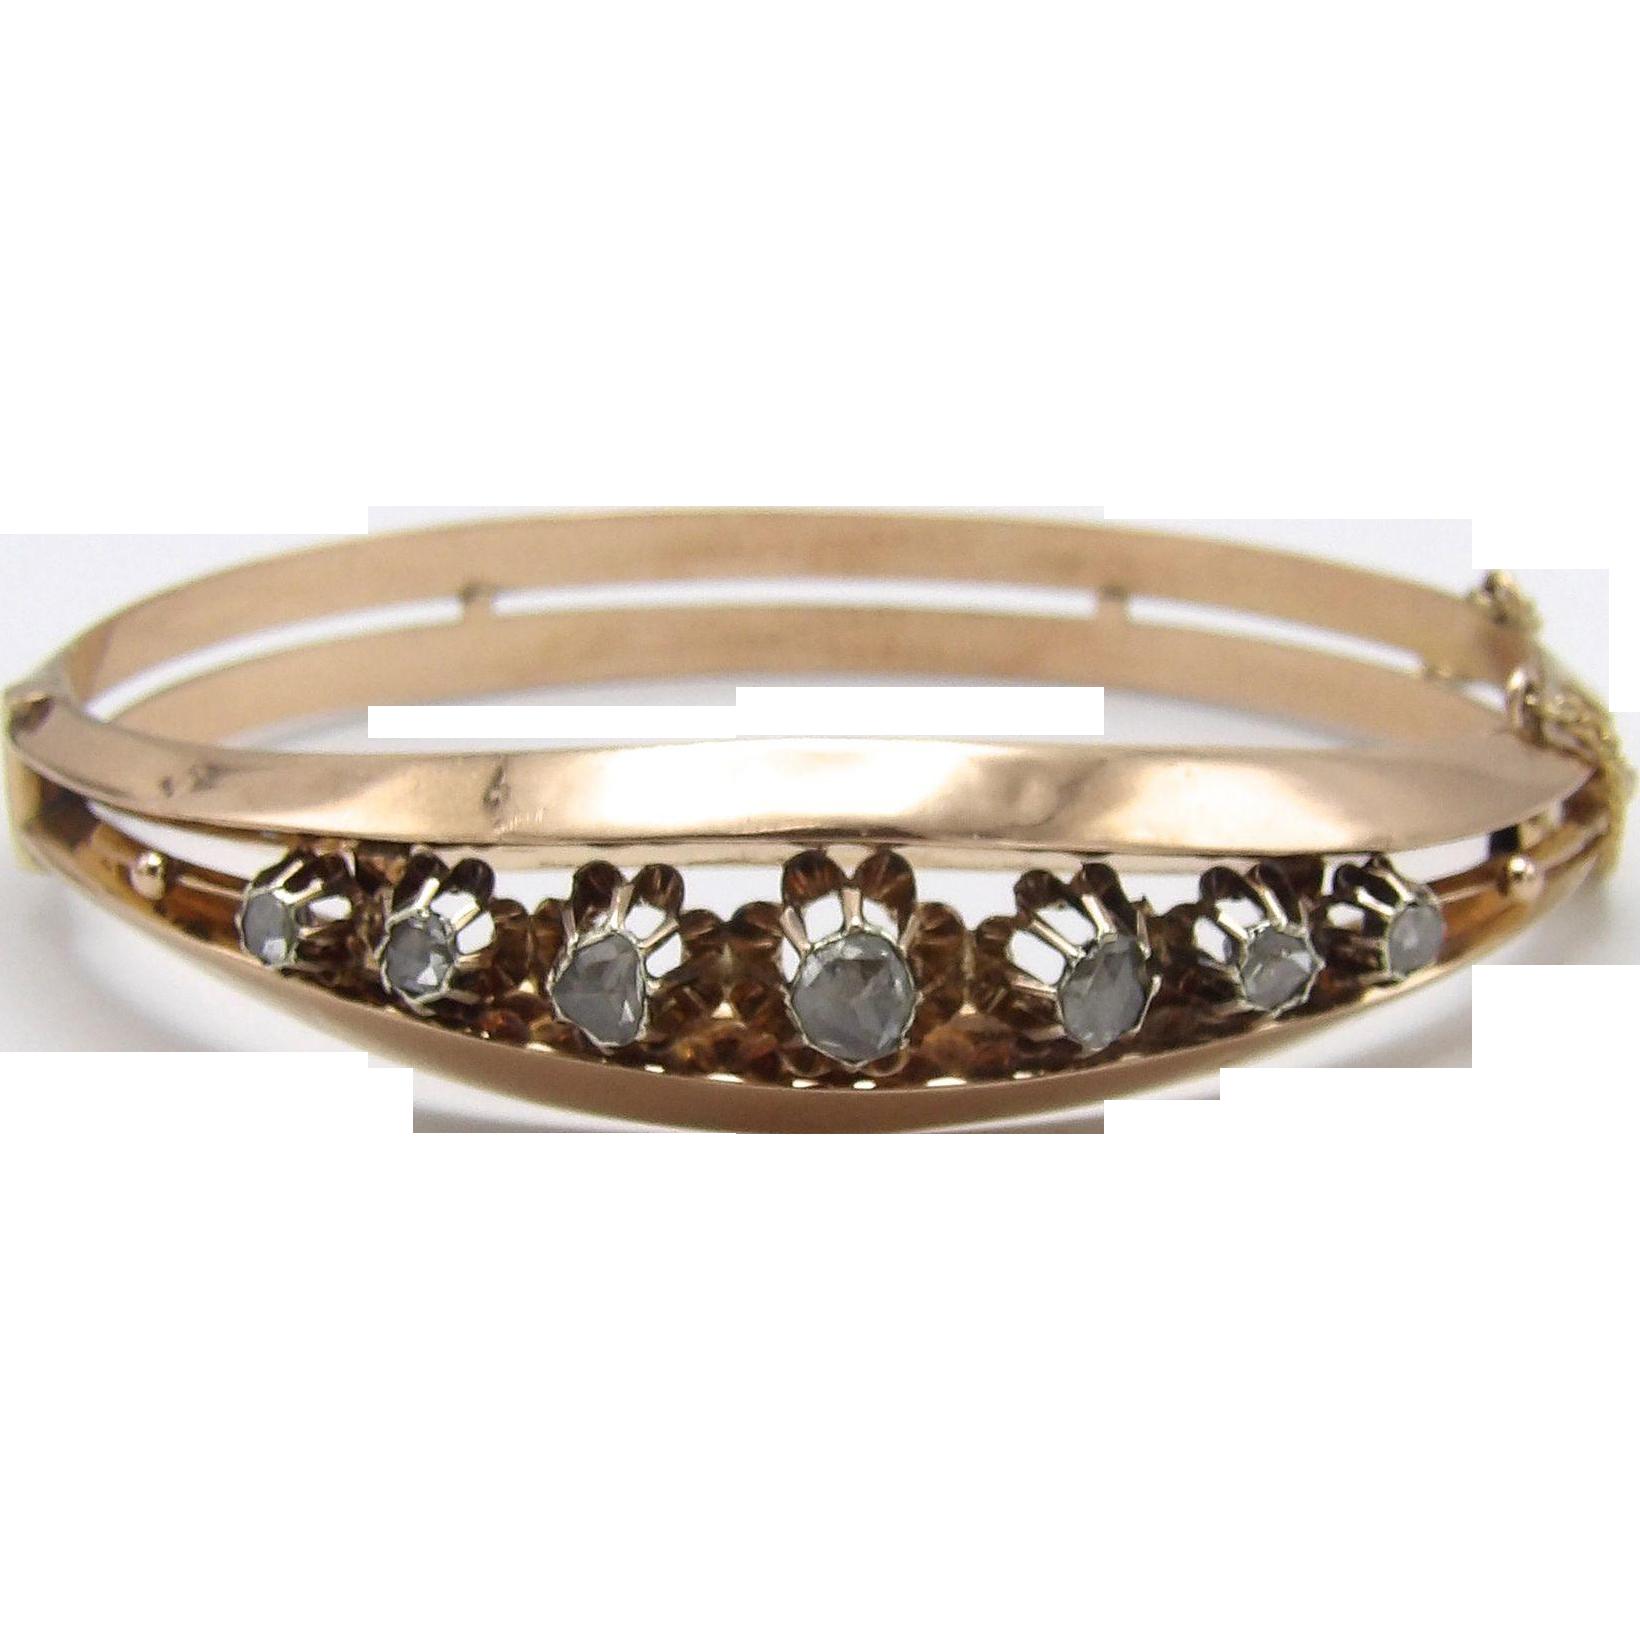 14KT Rose Gold & Diamond Bracelet